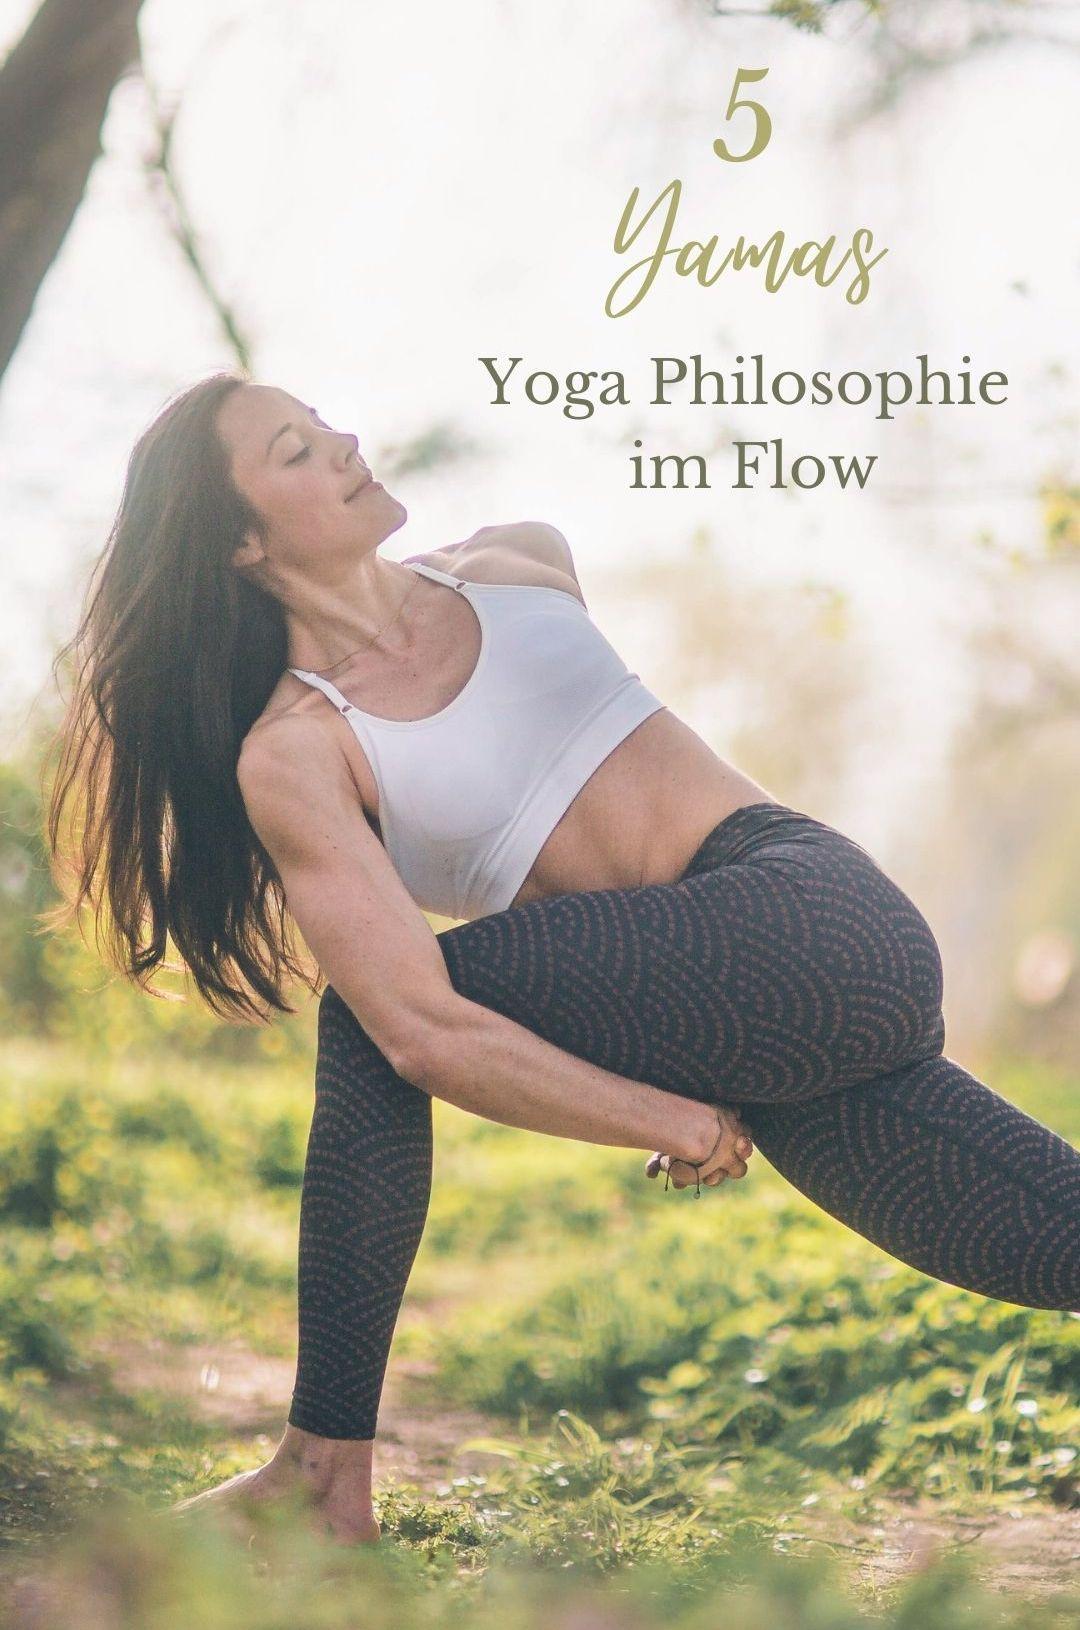 Yoga mit den 5 Yamas nach Patanjali